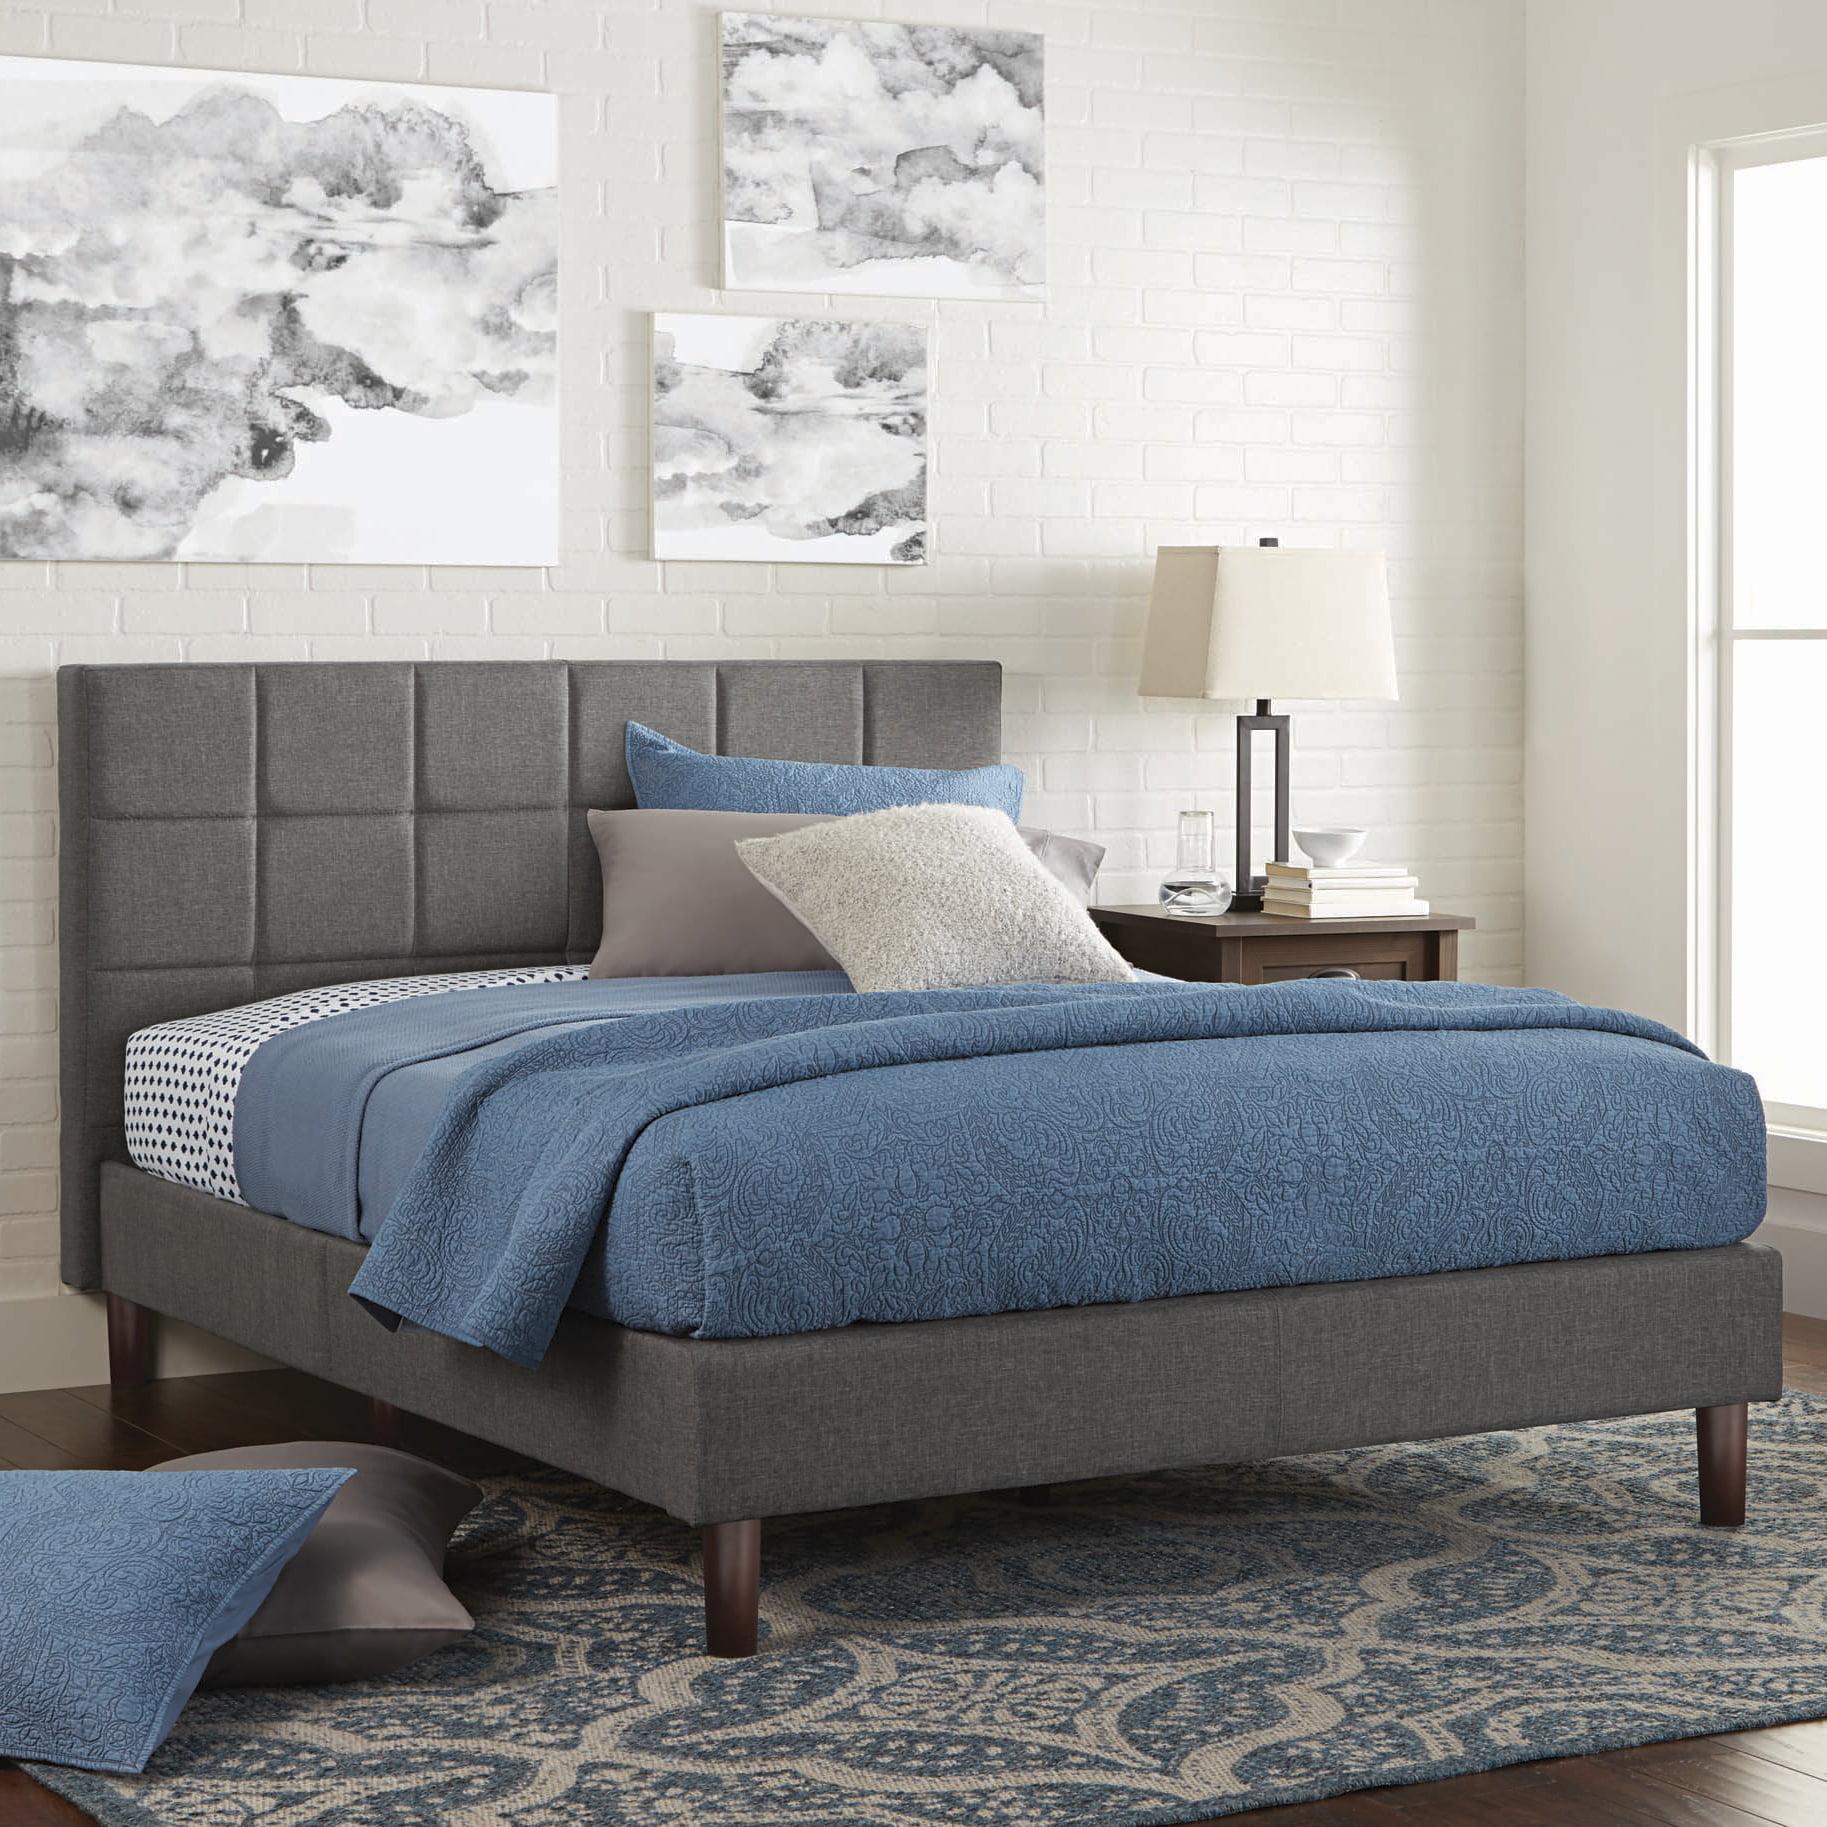 Better Homes And Gardens Knox Upholstered Platform Bed